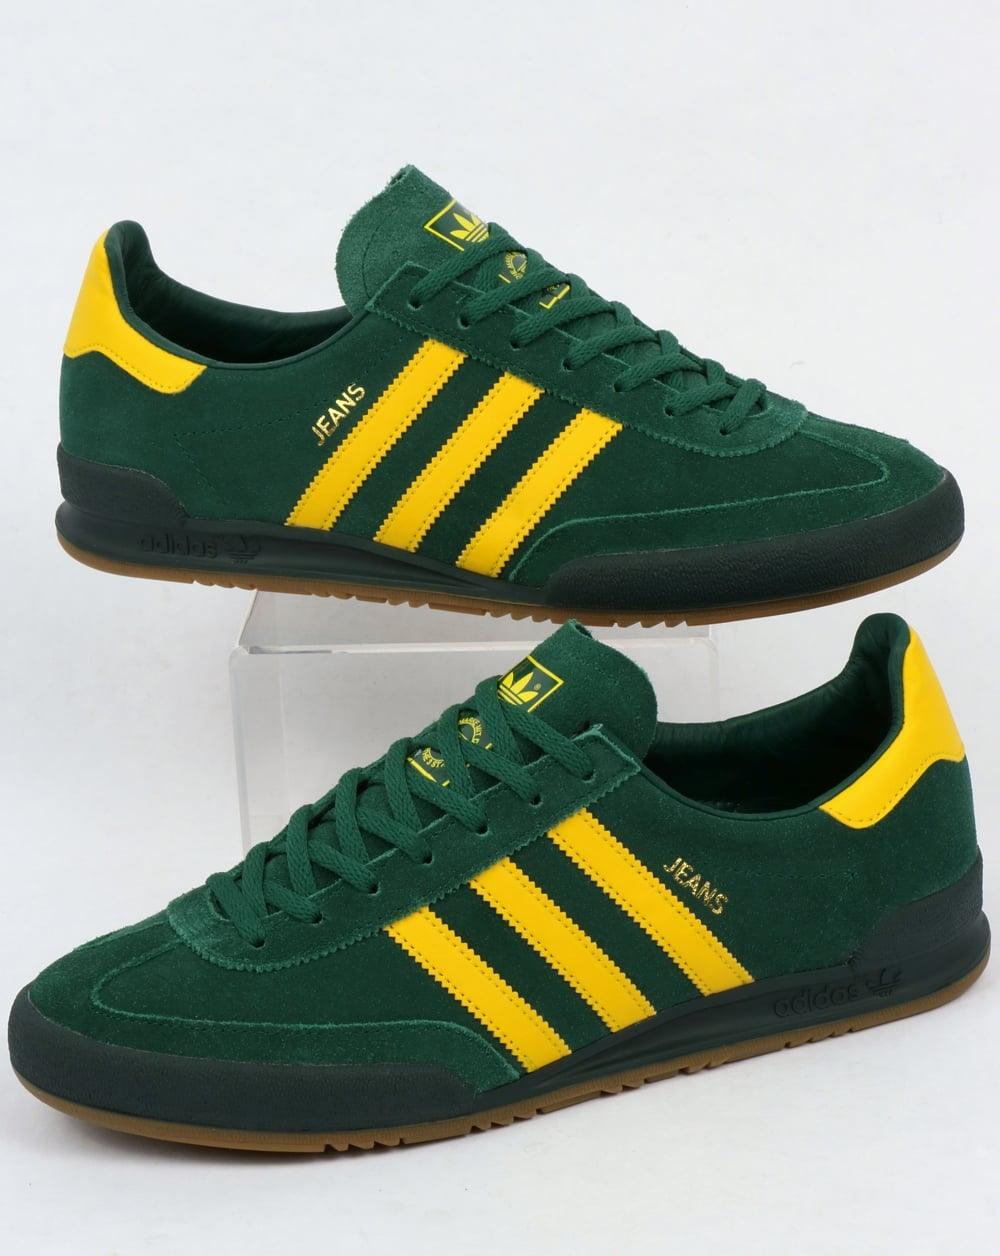 adidas la trainer green yellow - 65